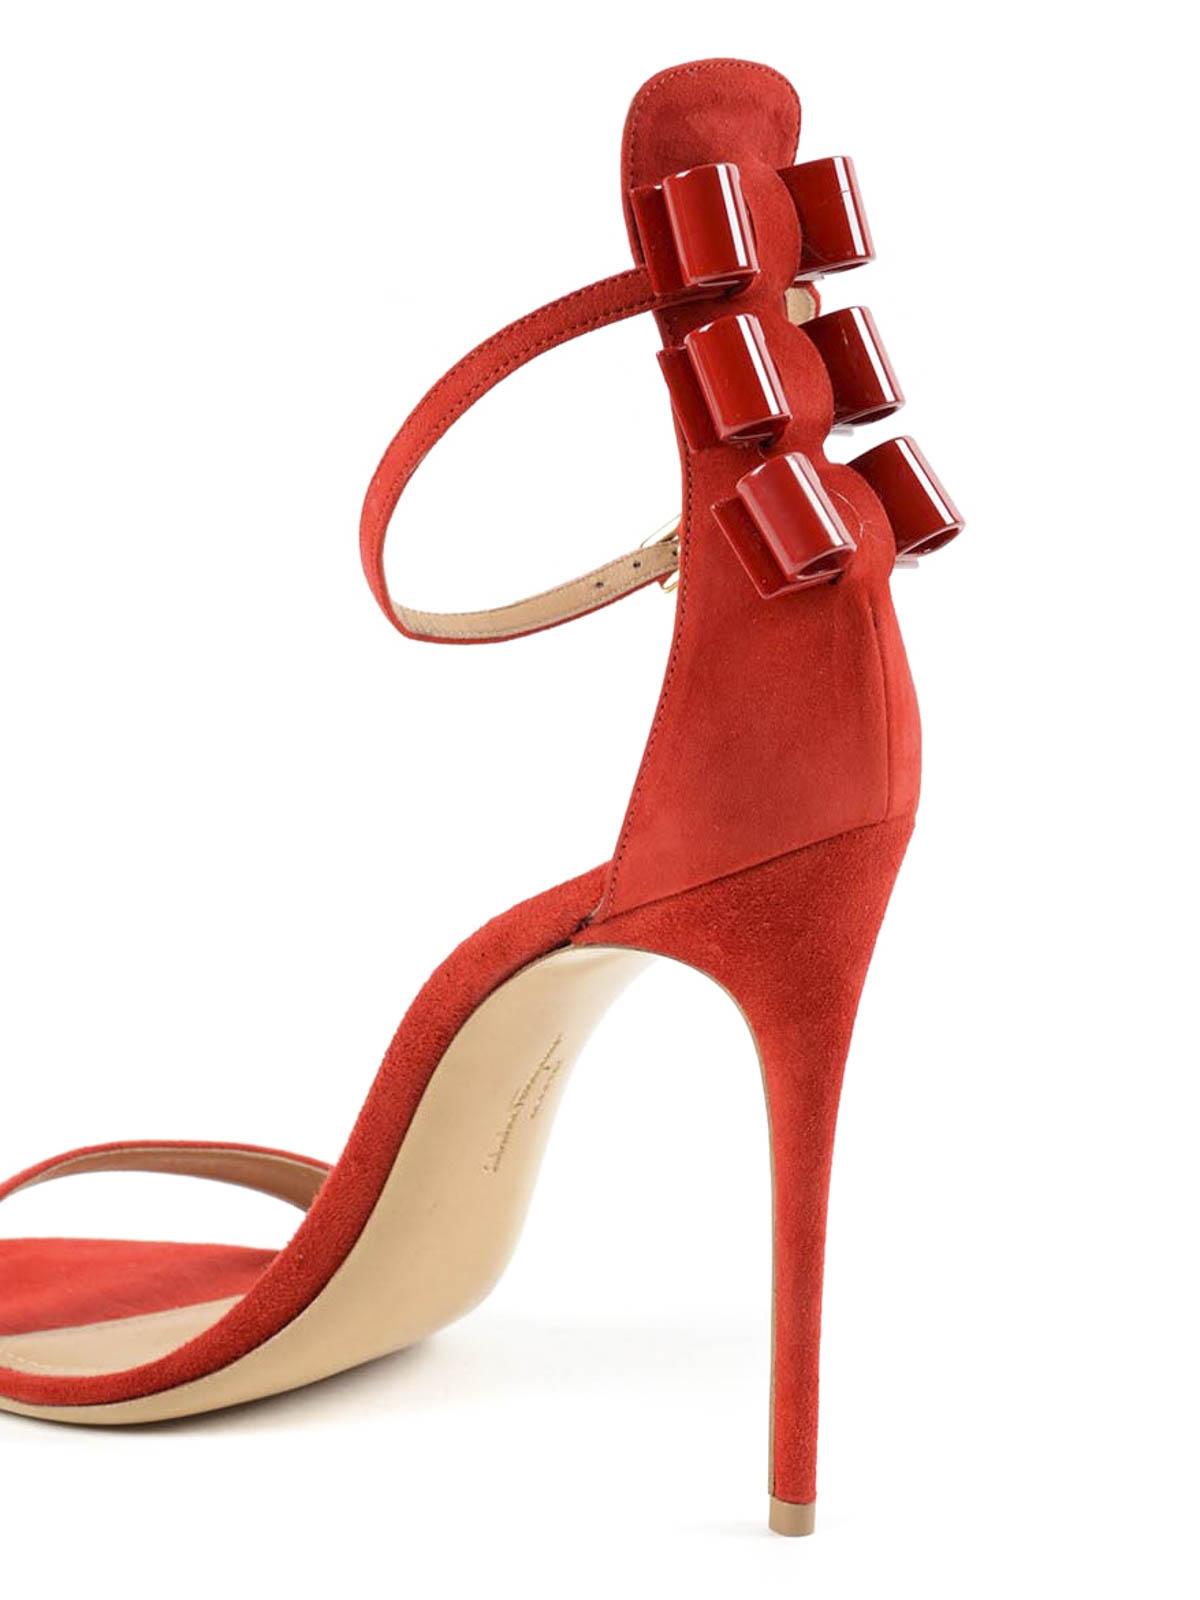 490b94207 Salvatore Ferragamo - Angie suede sandals - sandals - 01L011 ...